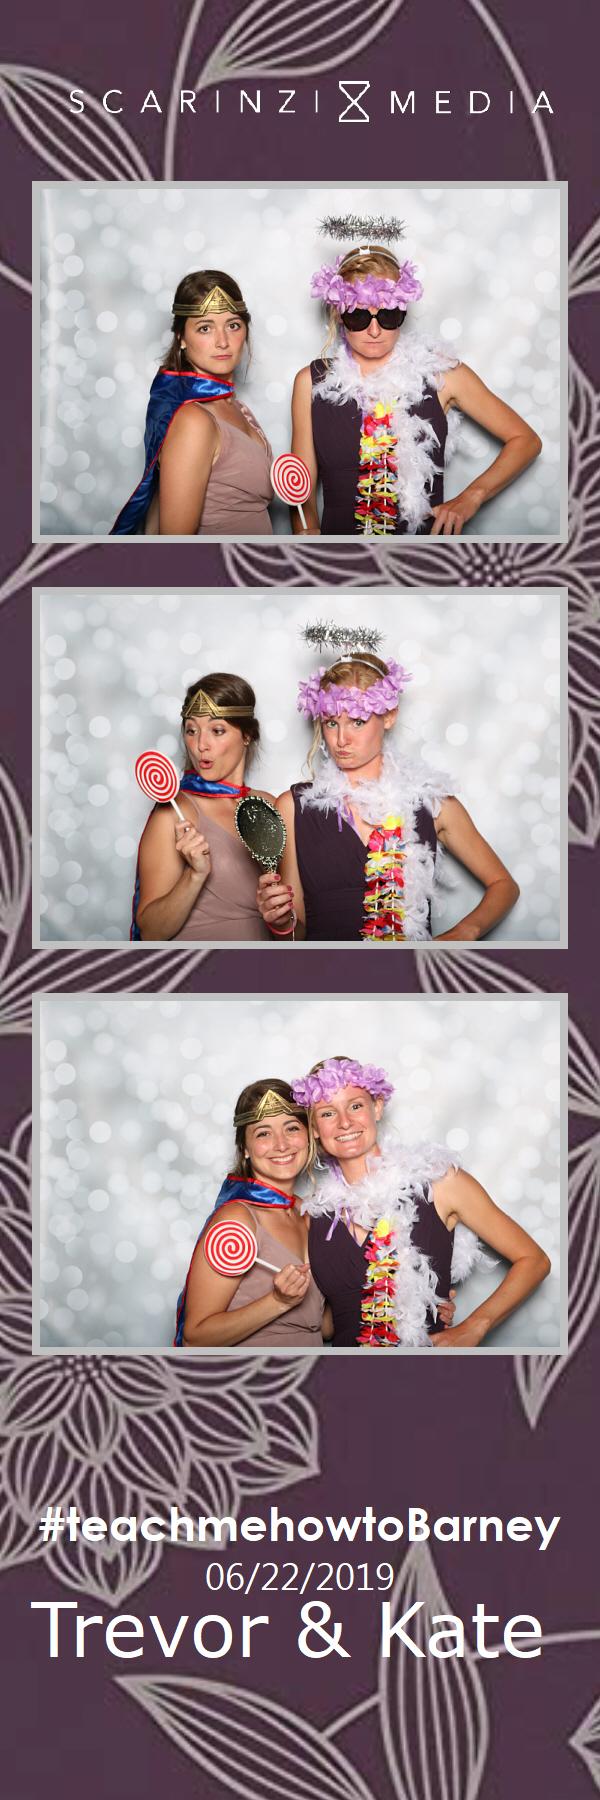 2019.06.22 - Barney Wedding PHOTOBOOTH50.jpg